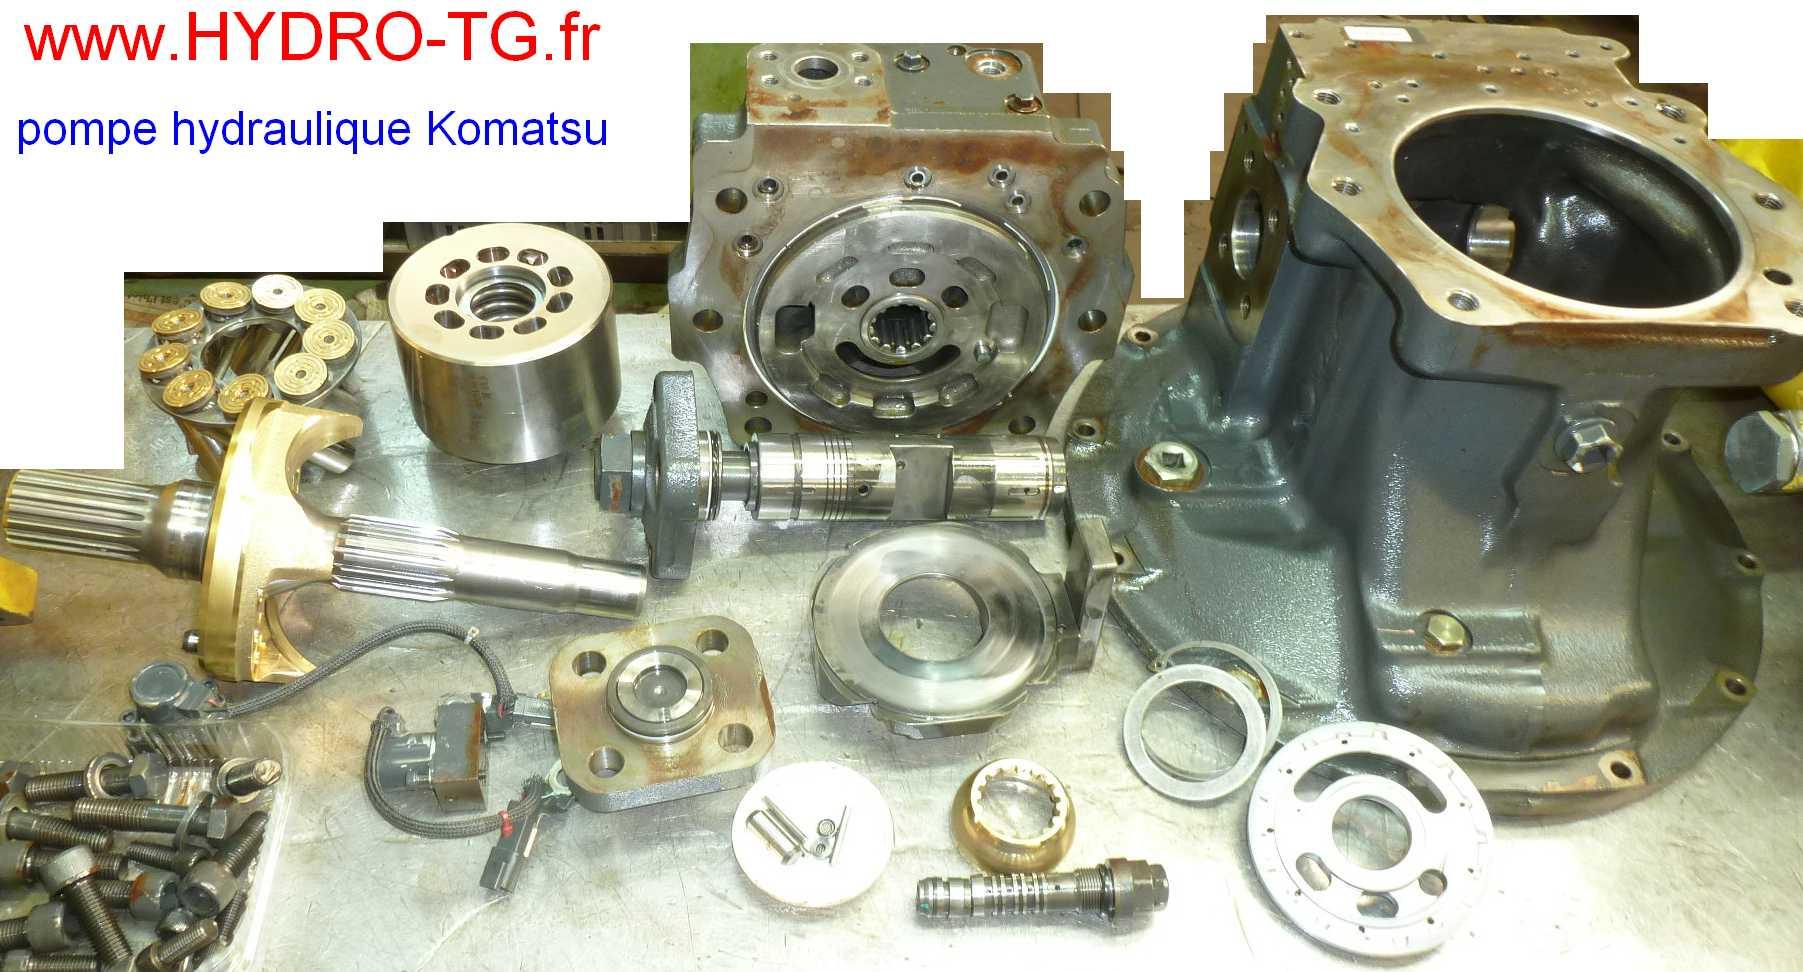 komatsu revovation pompe hydraulique